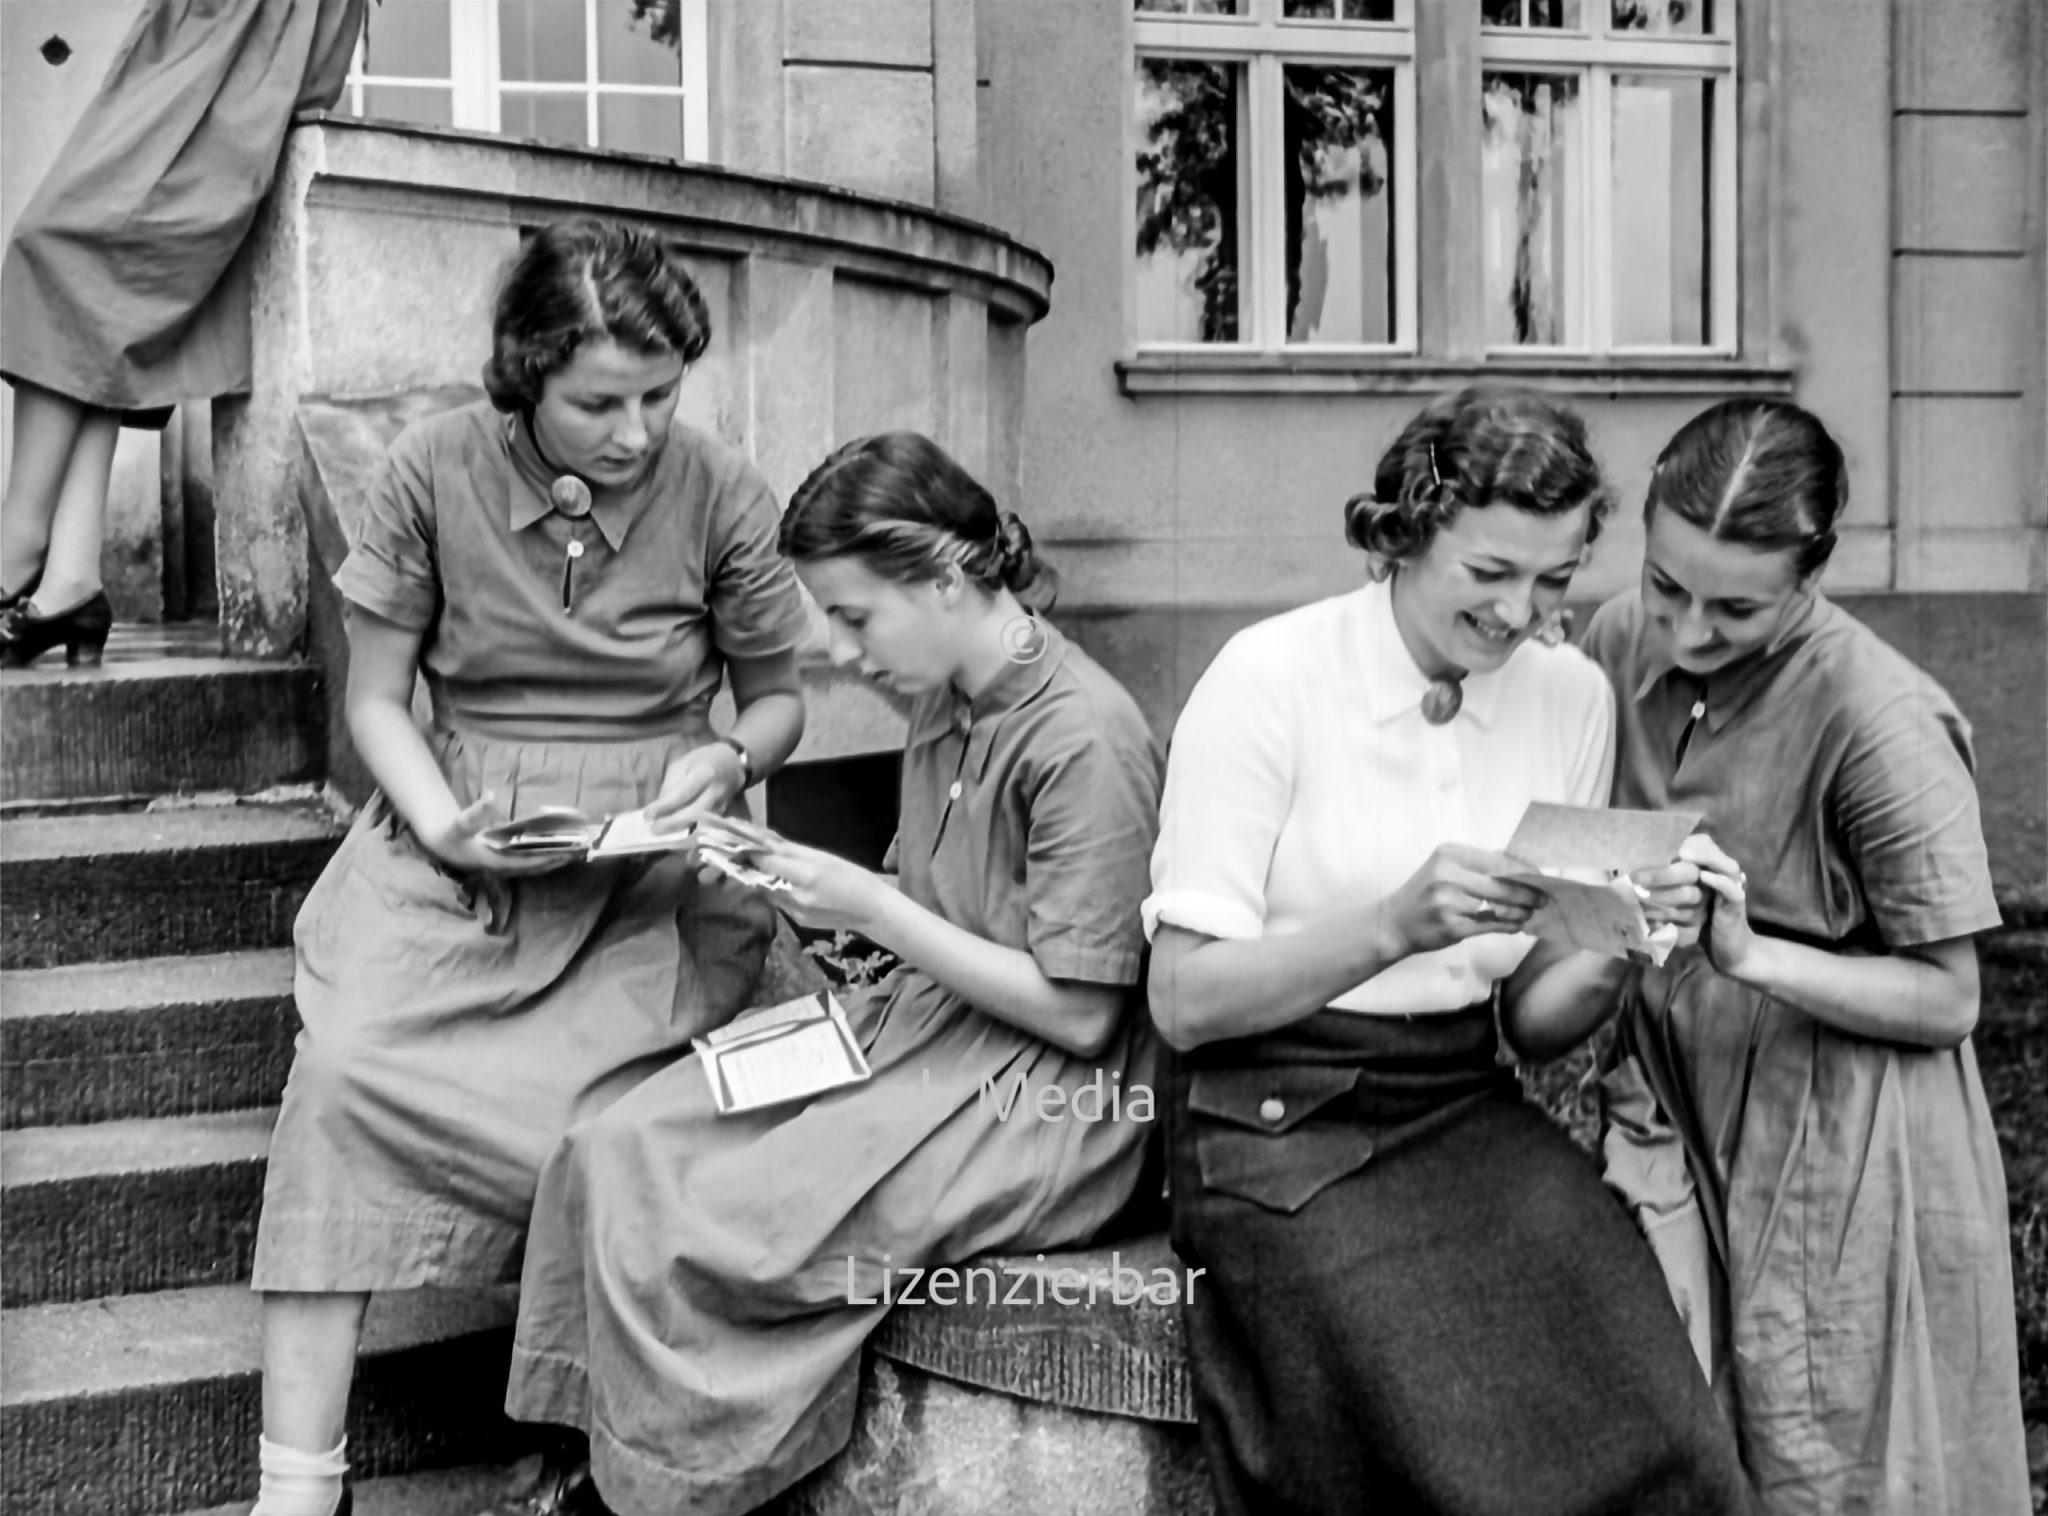 Erzieher im Pestalozzi-Fröbel-Haus Berlin 1937